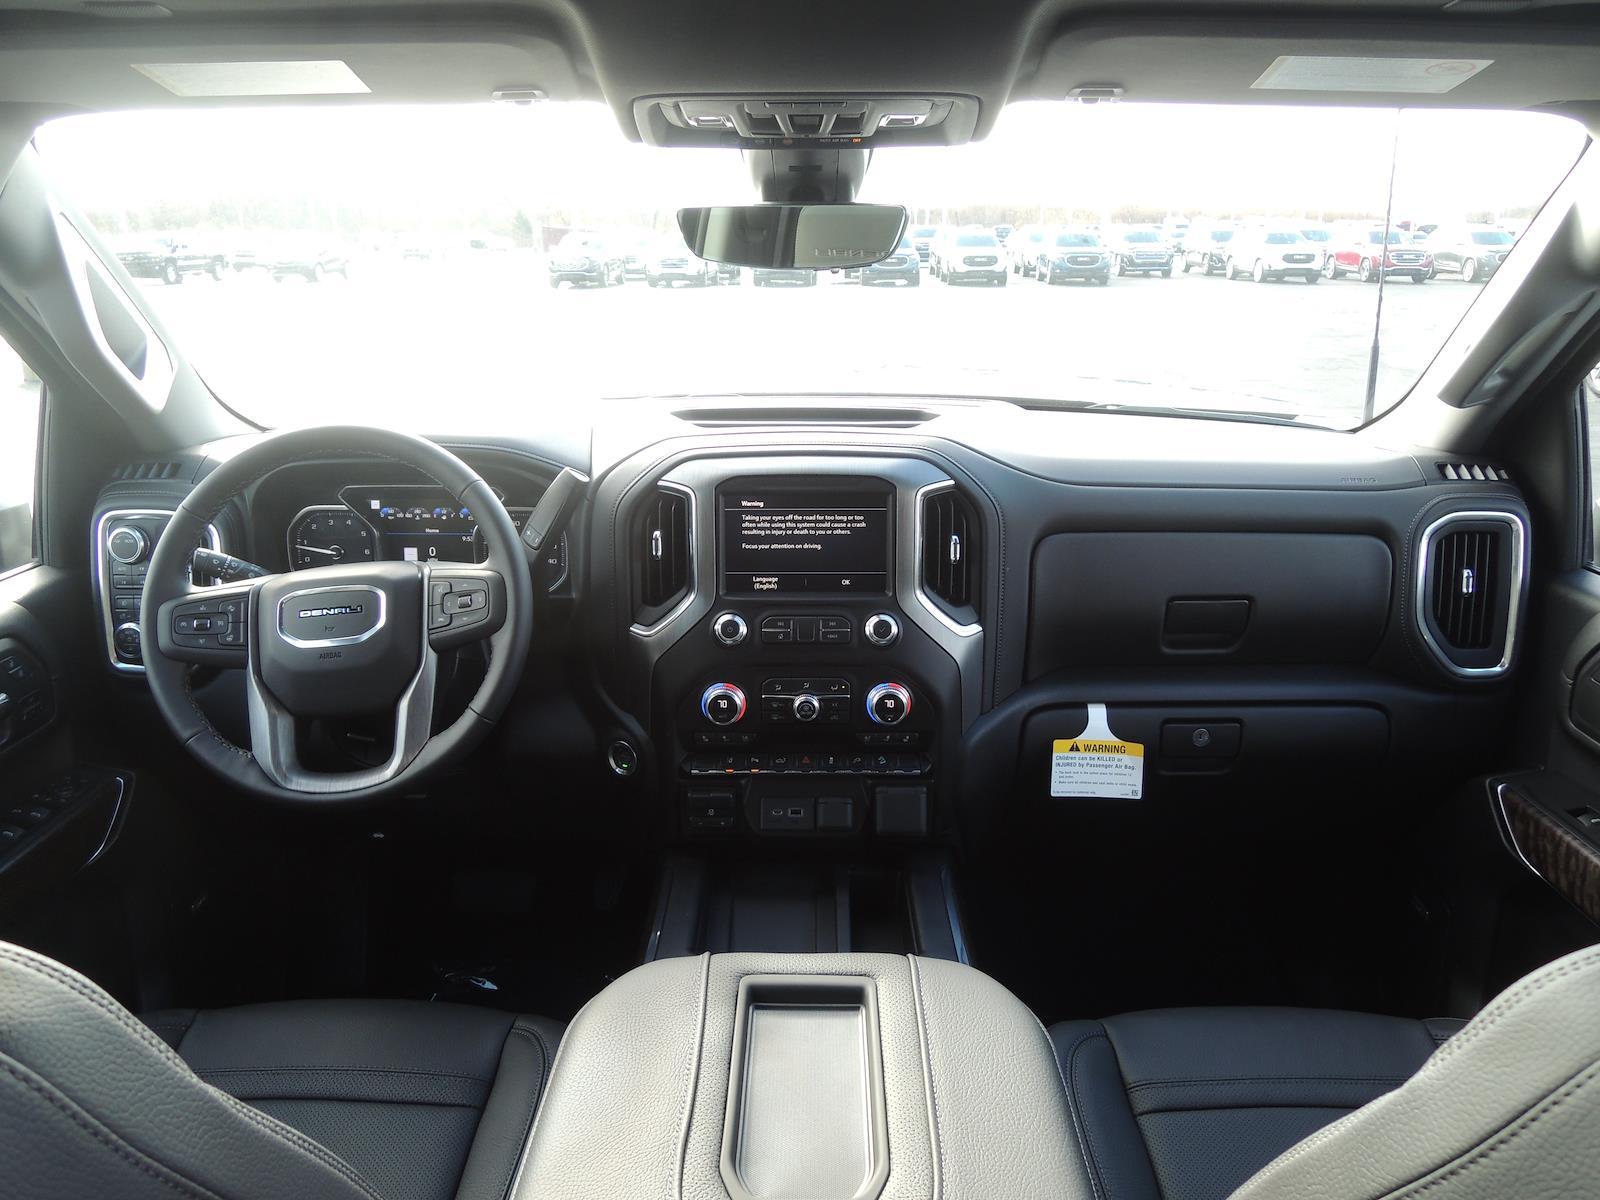 2021 GMC Sierra 2500 Crew Cab 4x4, Pickup #MT488 - photo 14